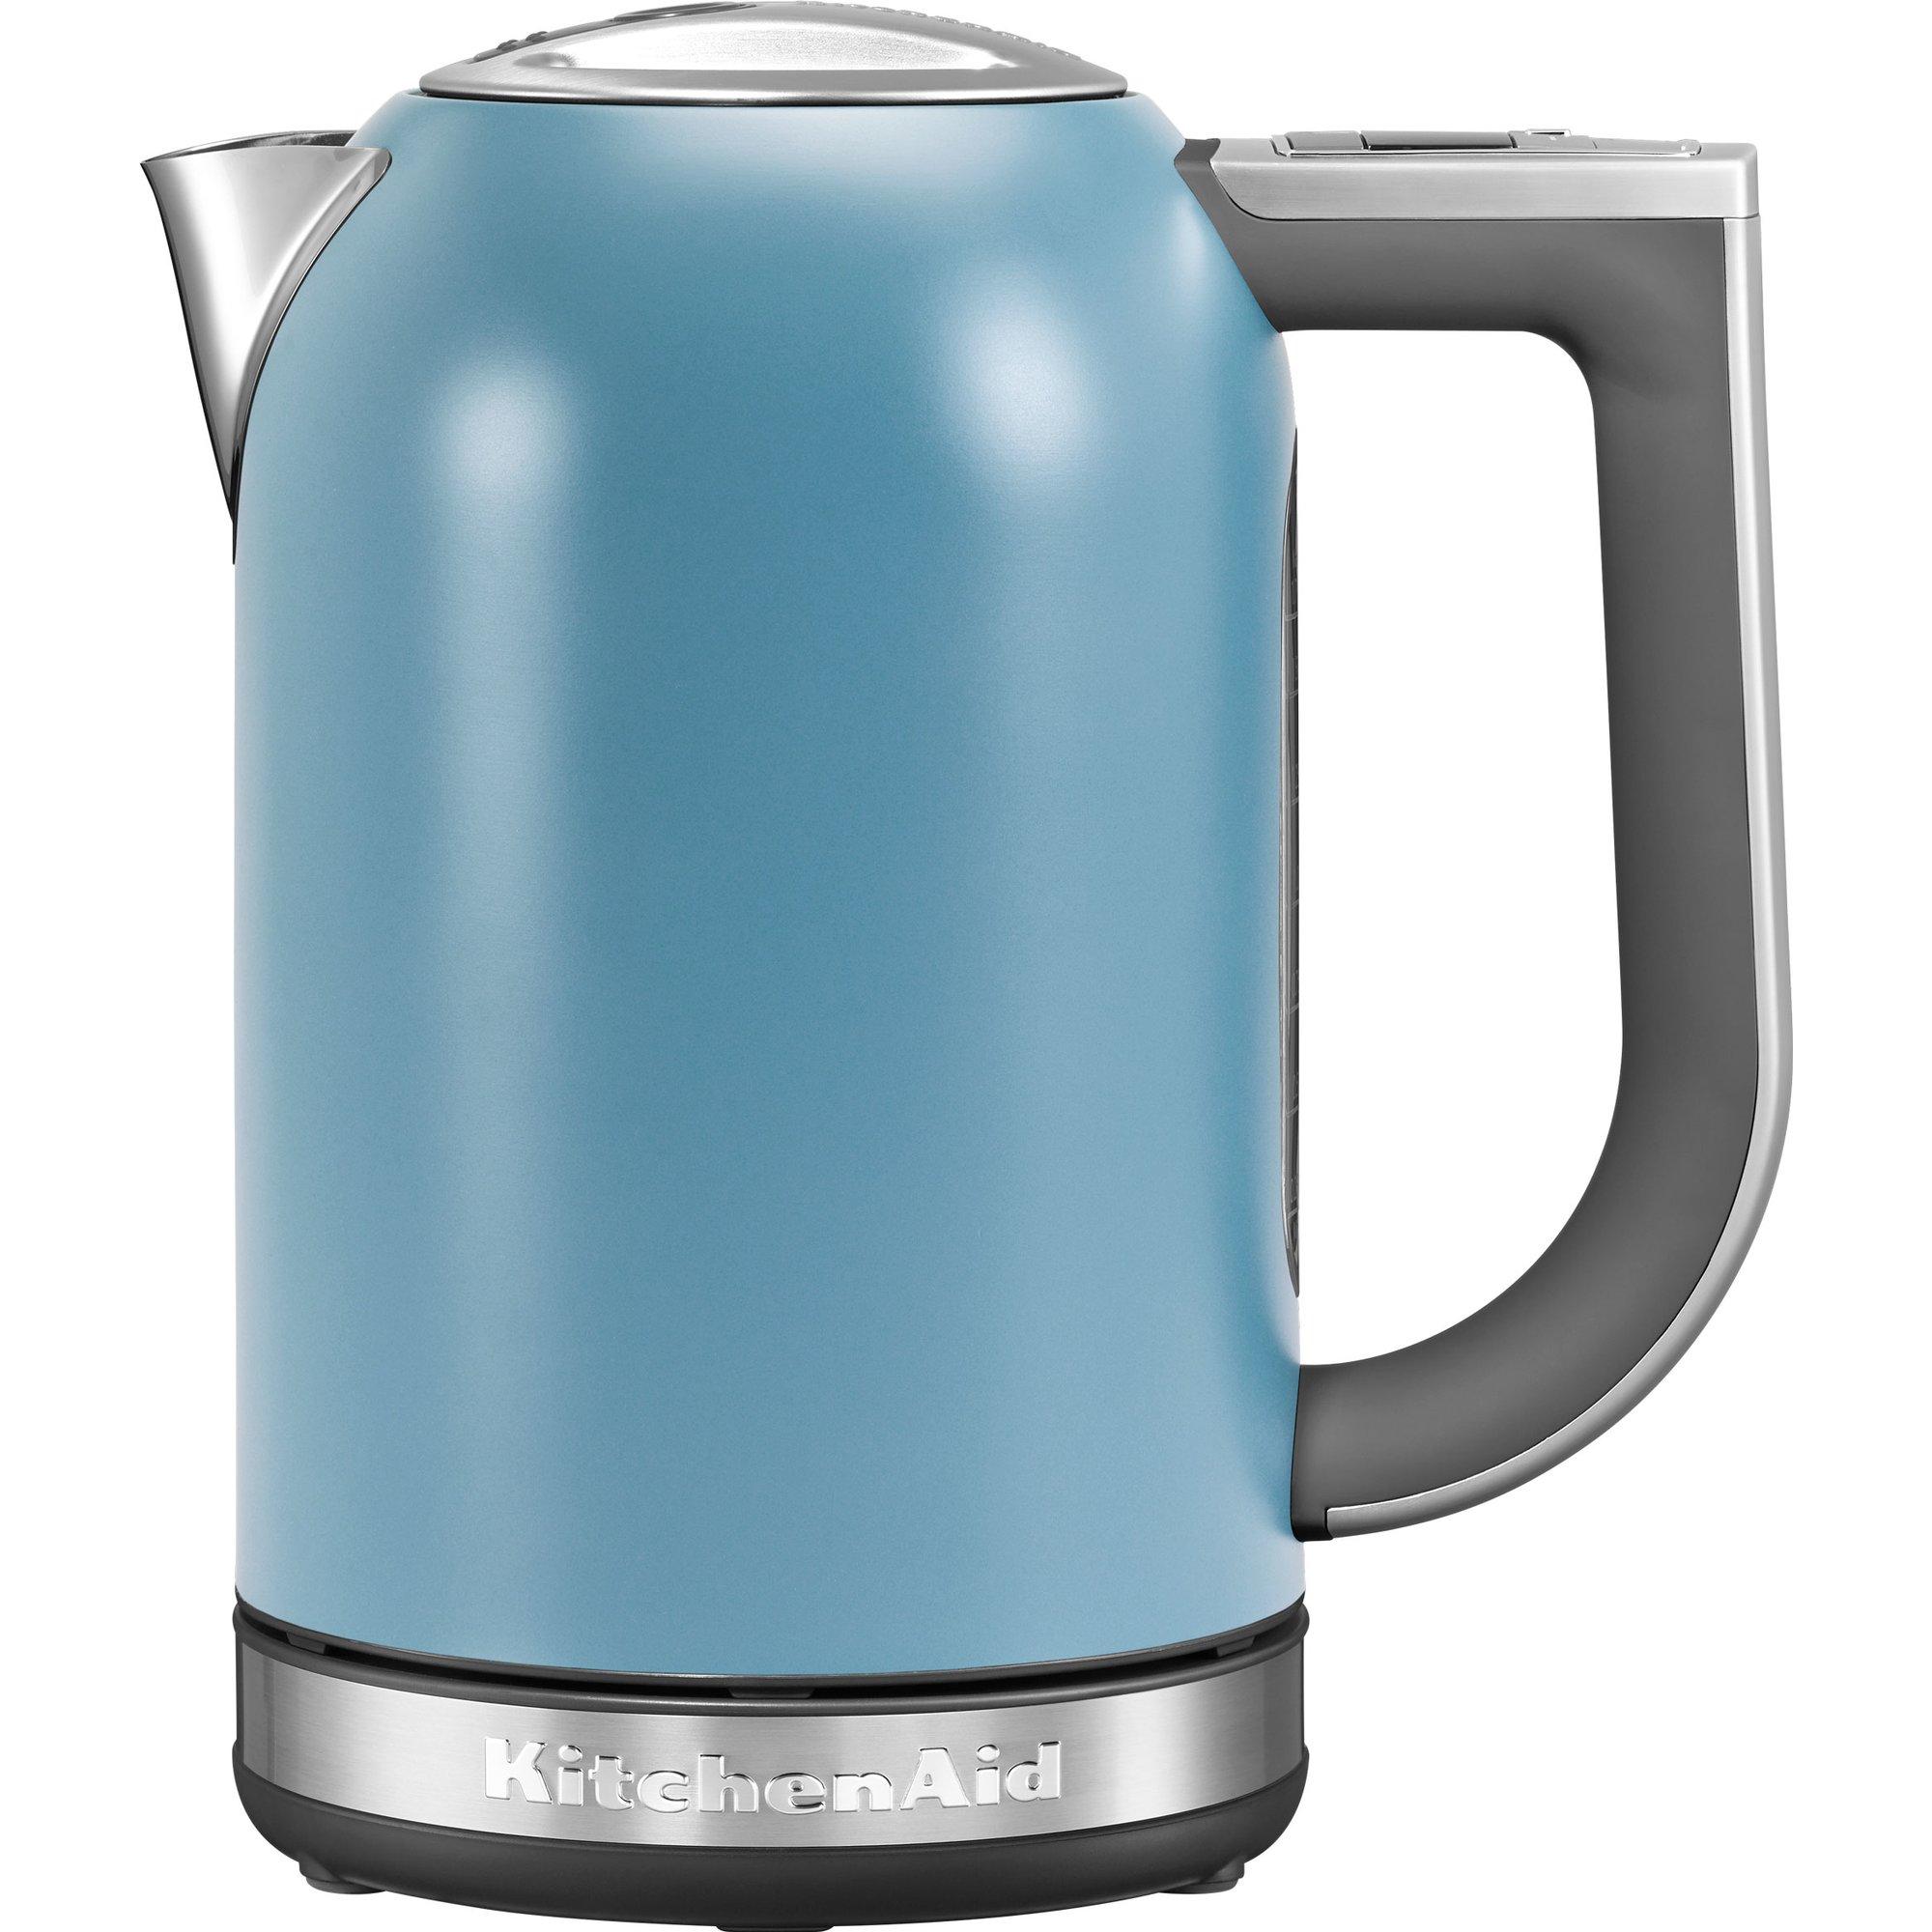 KitchenAid Vattenkokare Vintage blue 17 liter